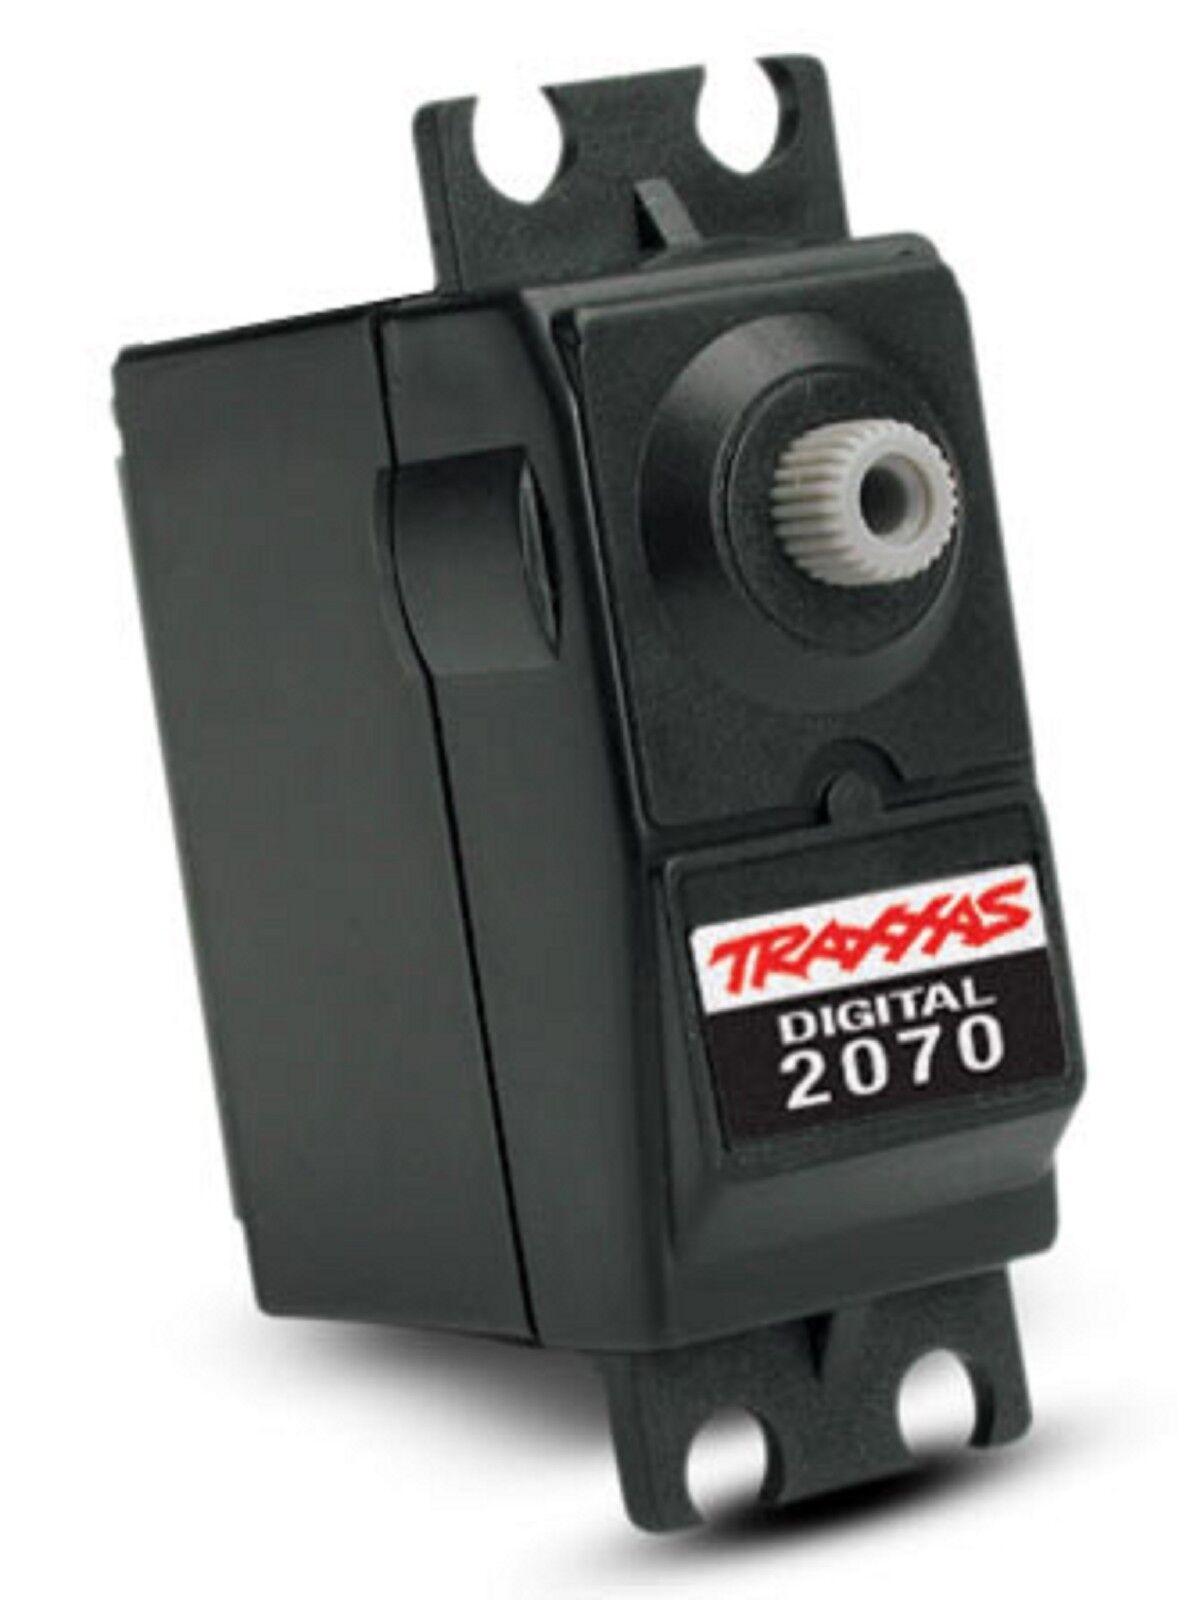 Traxxas TRA2070 Digital Ball Ball Ball Bearing Servo 125 oz-in torque Transit time 0.60° fee797